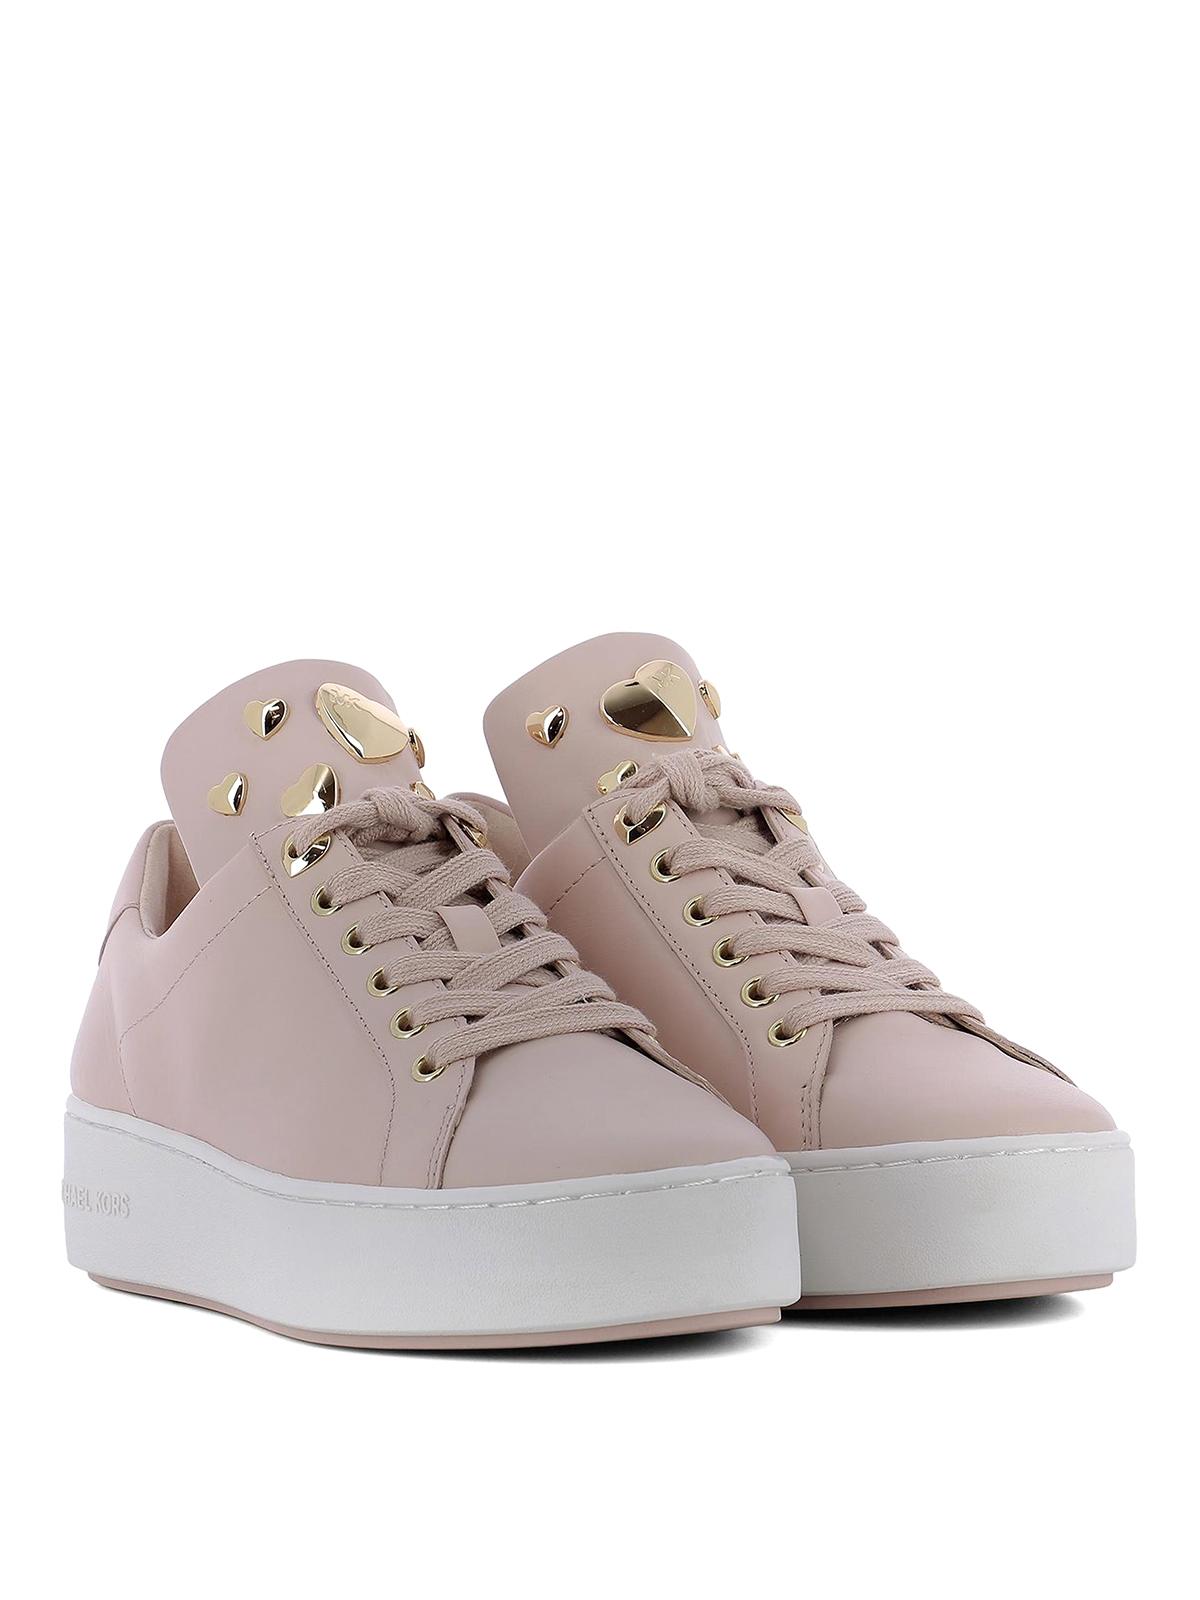 pink michael kors tennis shoes